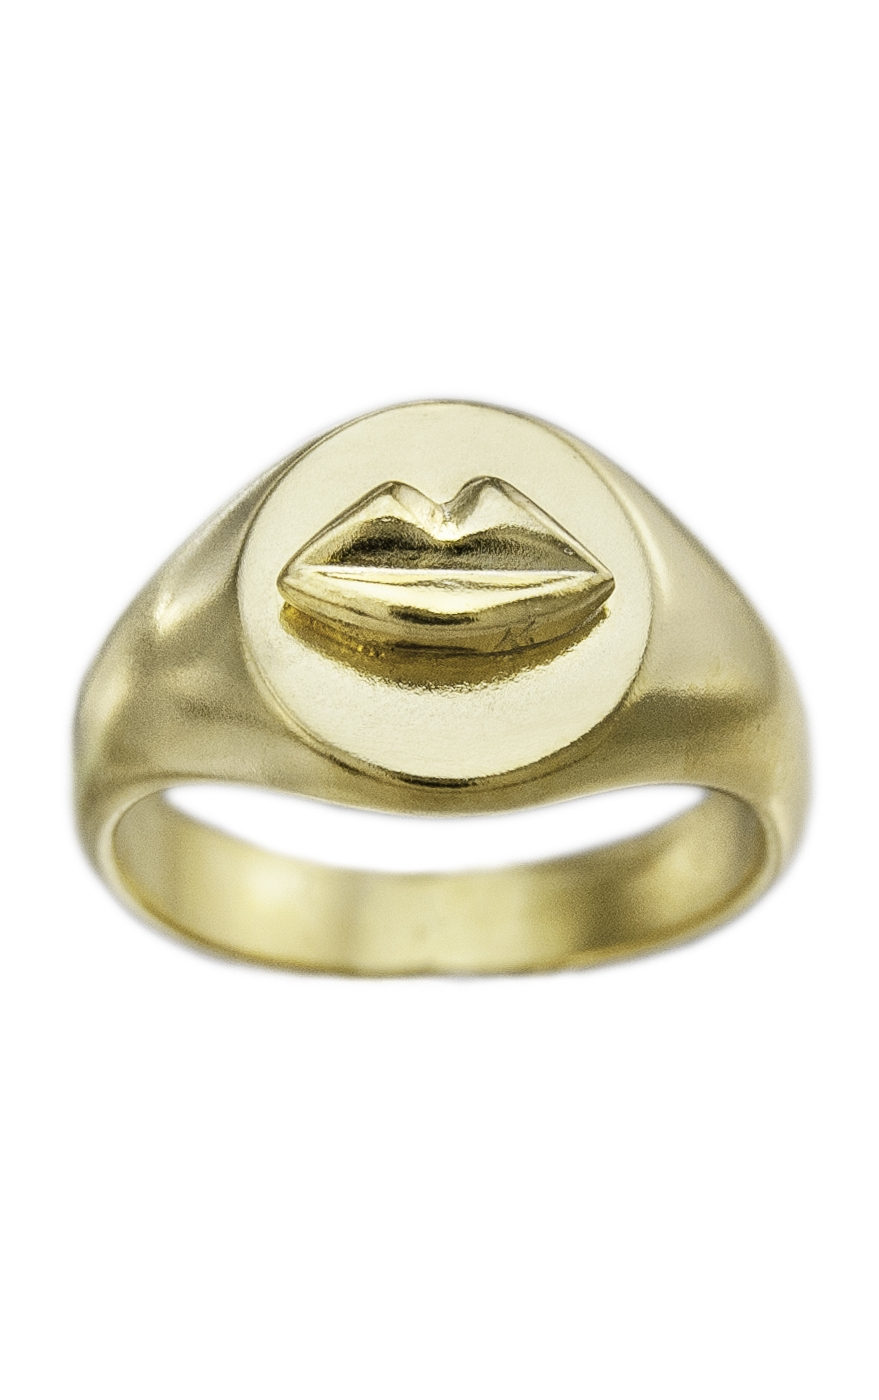 Kozminka signet ring